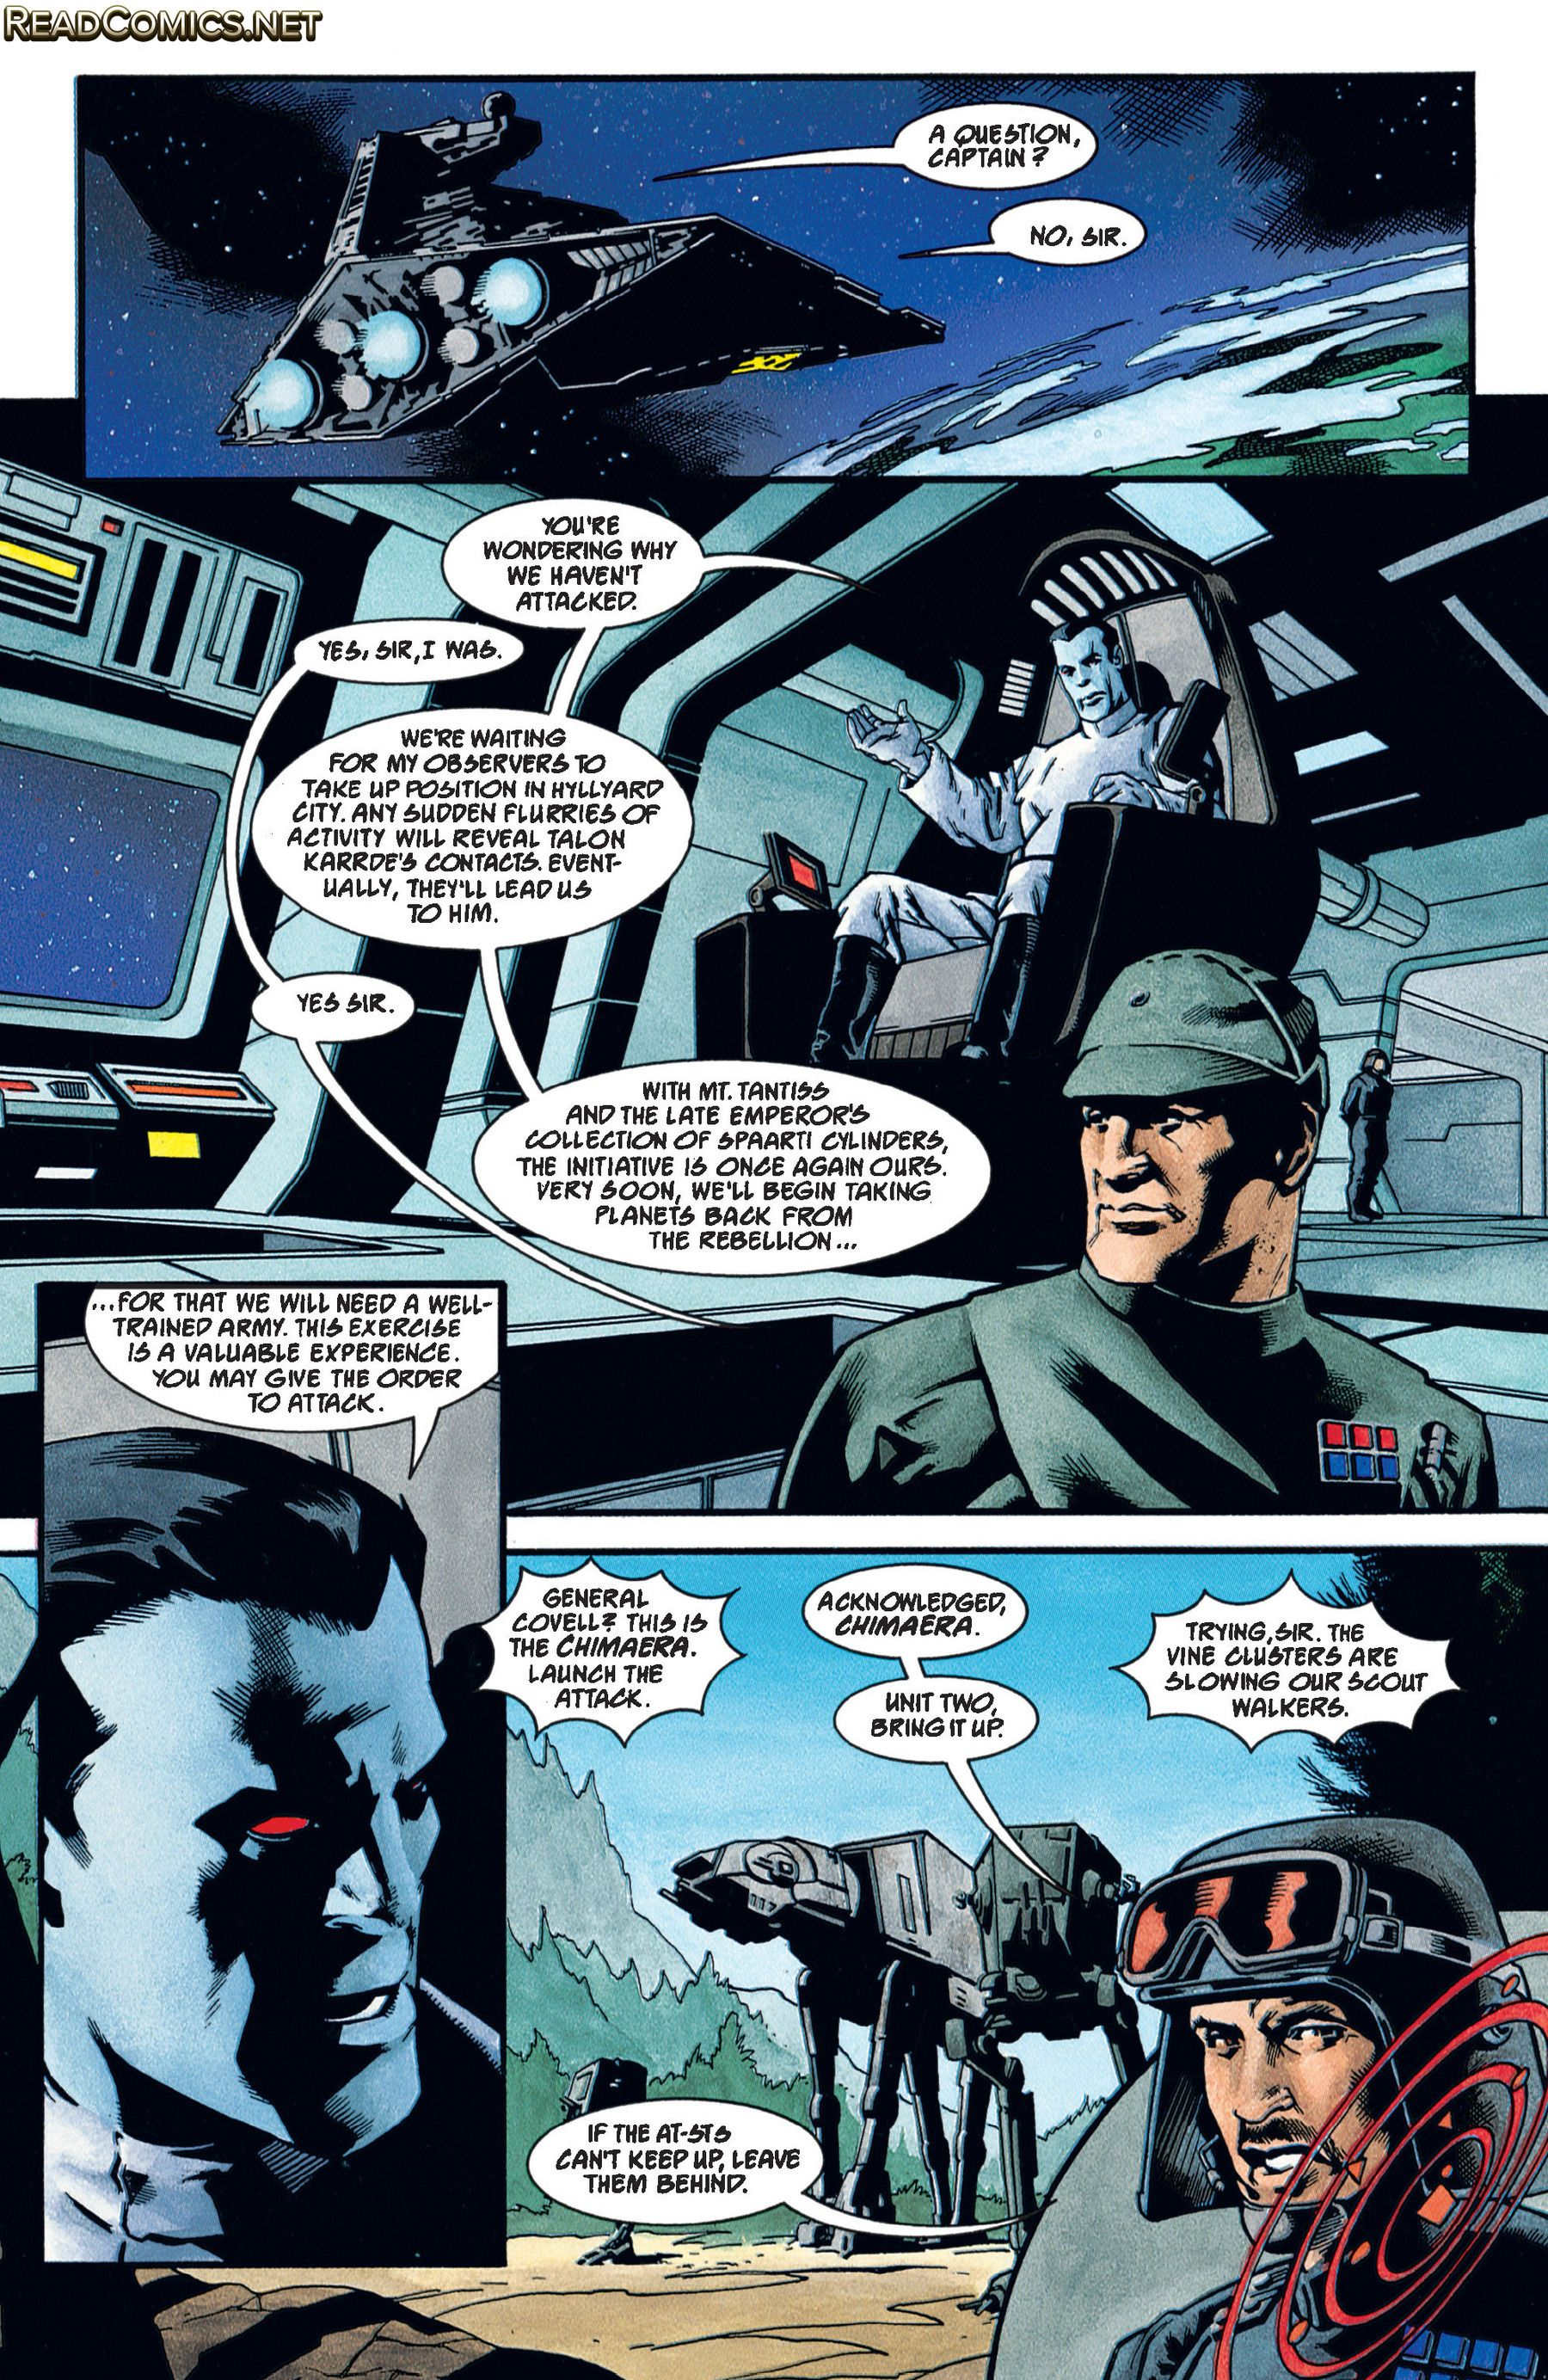 Star Wars: Dark Force Rising #1